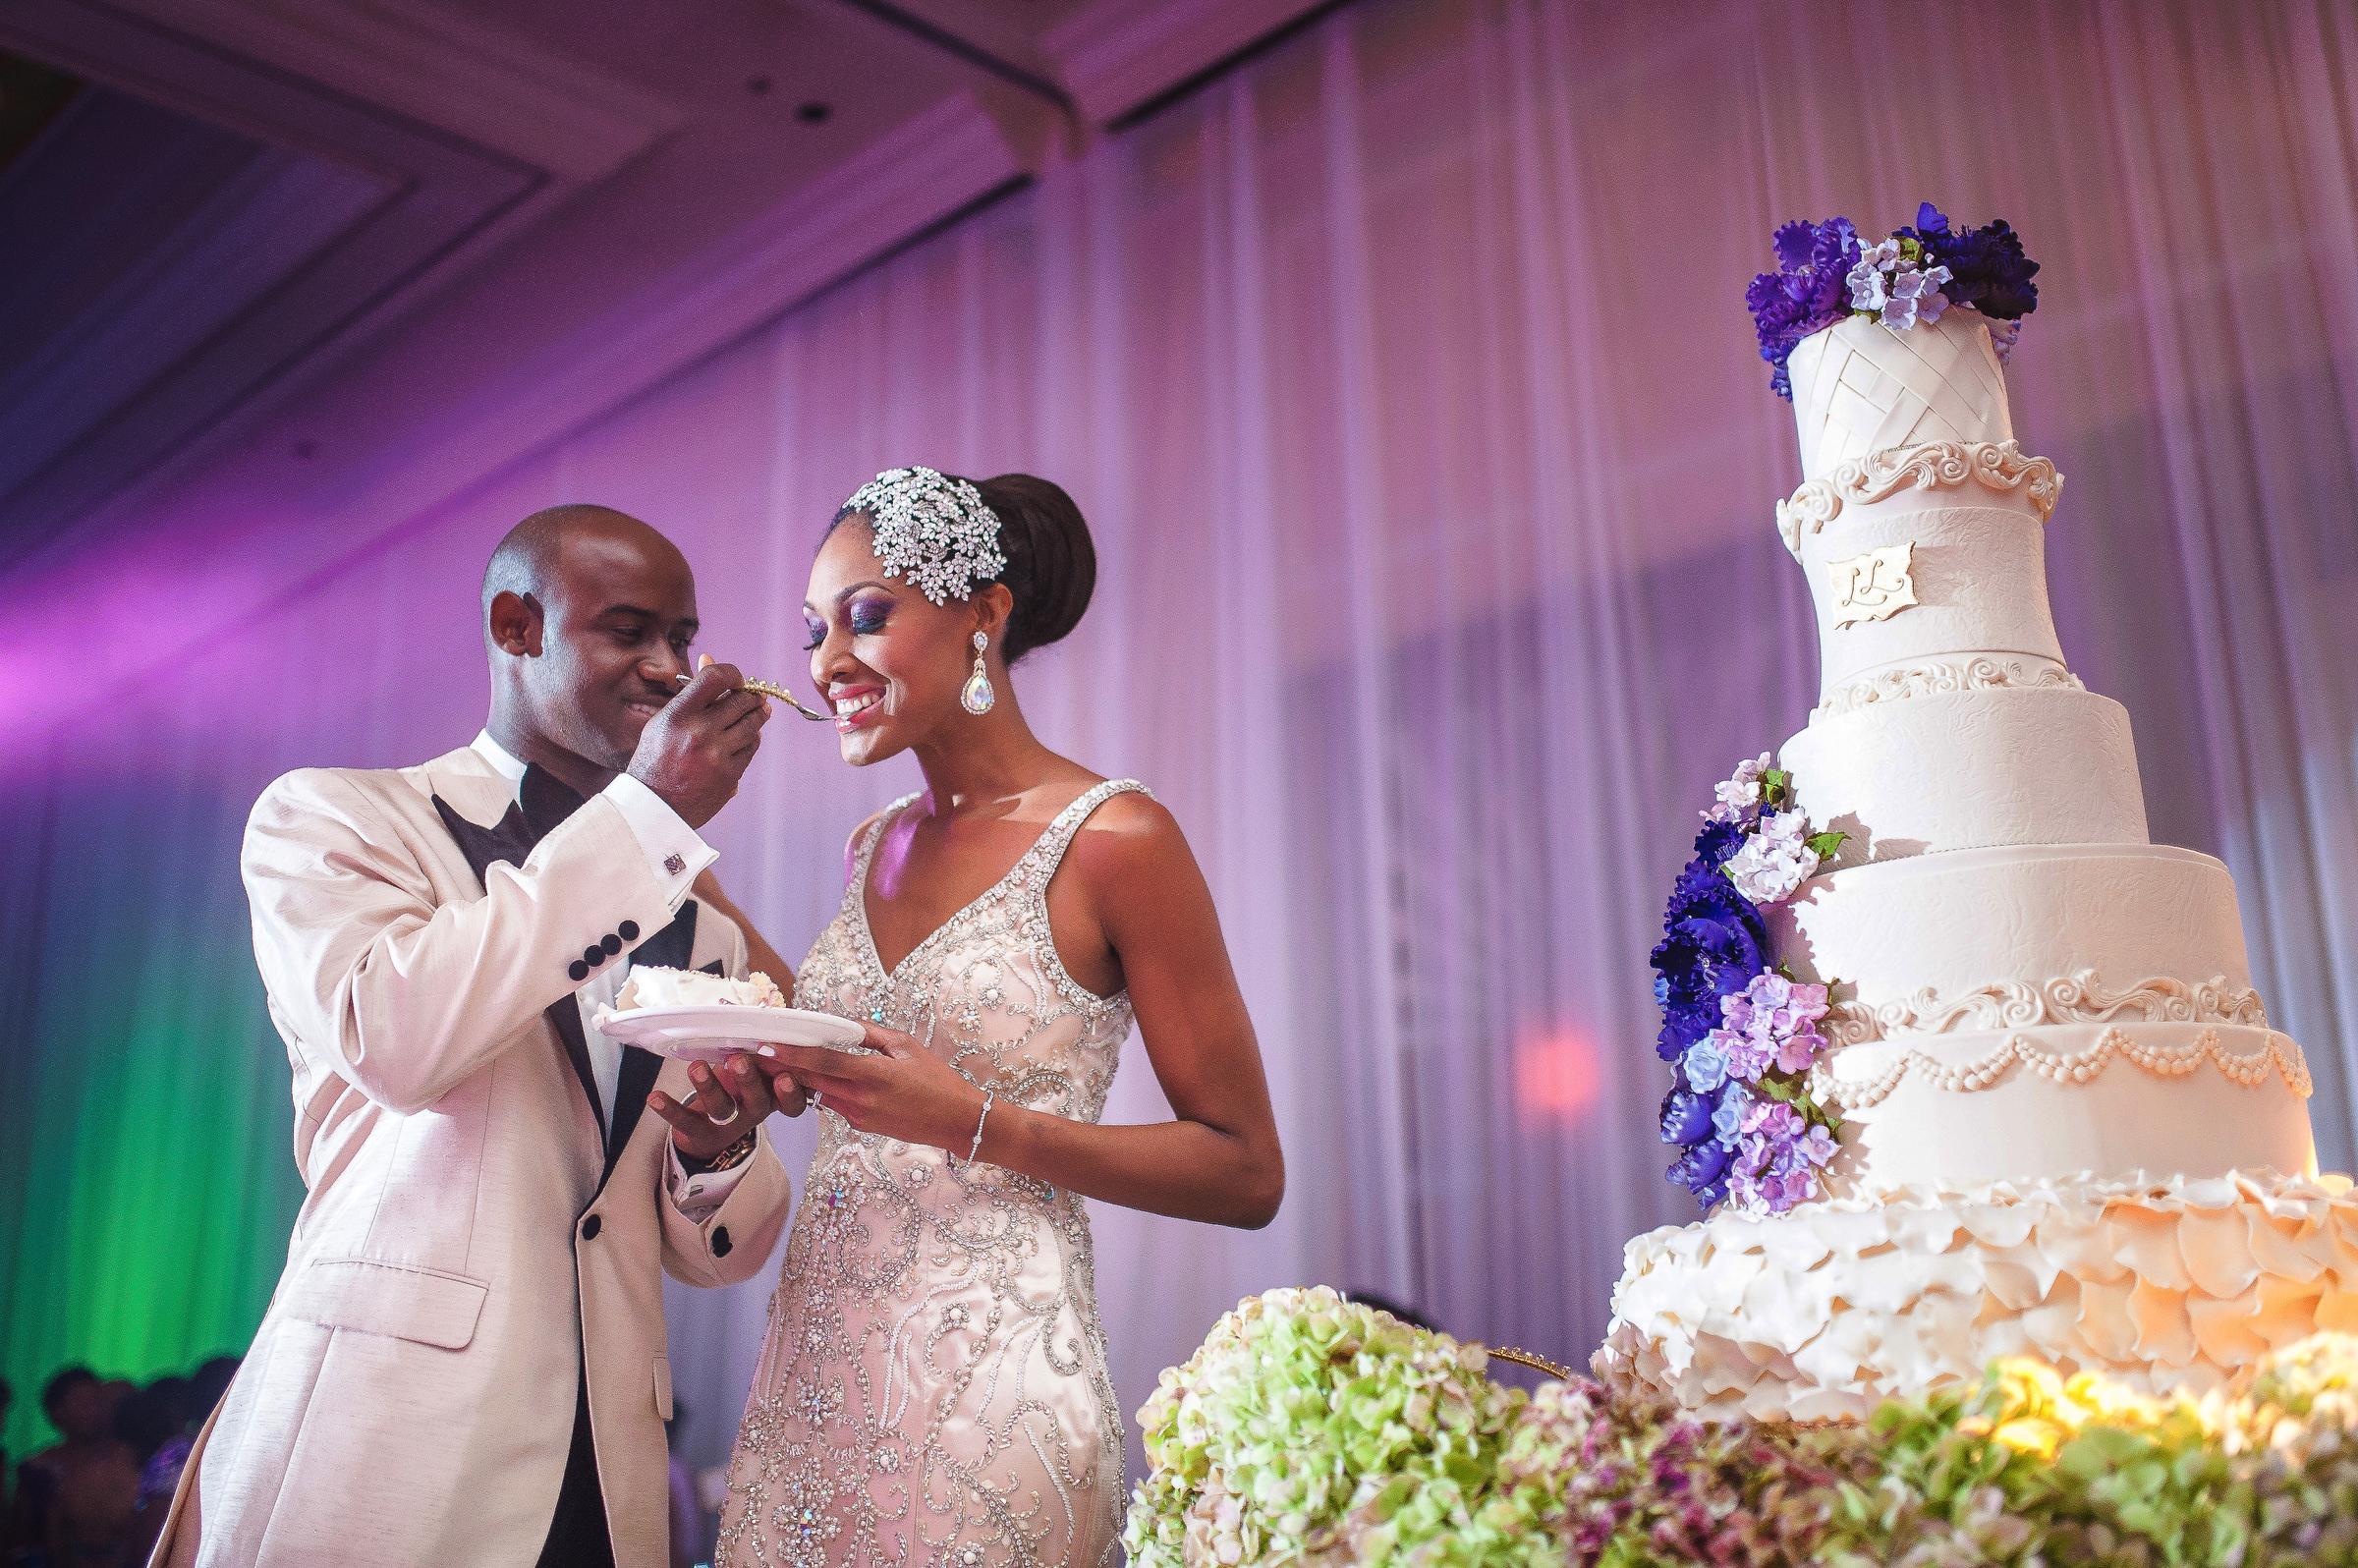 groom-feeding-the-bride-cake-against-6-tiered-cake-kirth-bobb-photography